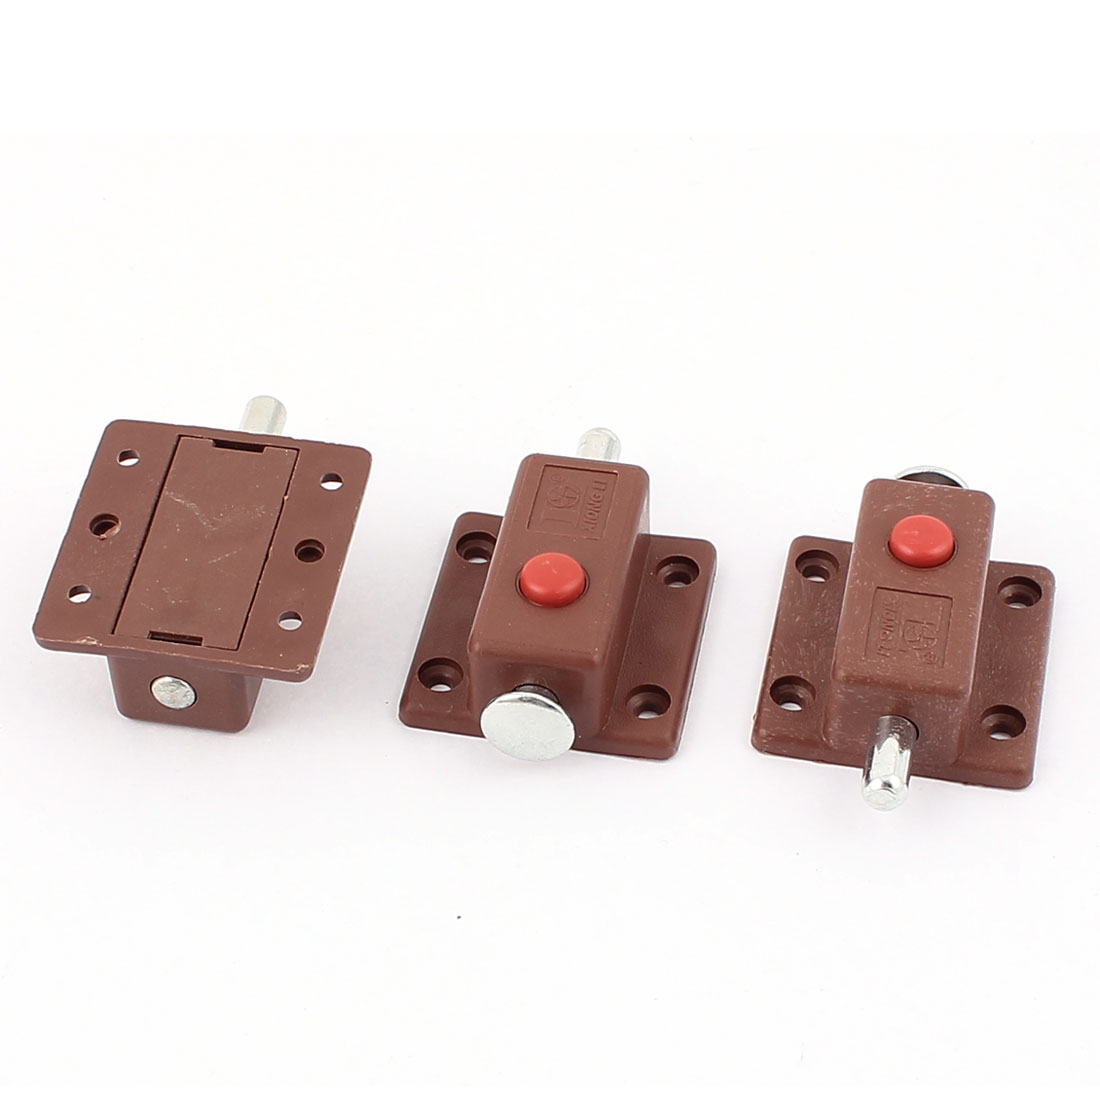 Round Push Button Control Cupboard Door Latch Lock Barrel Bolt 3pcs